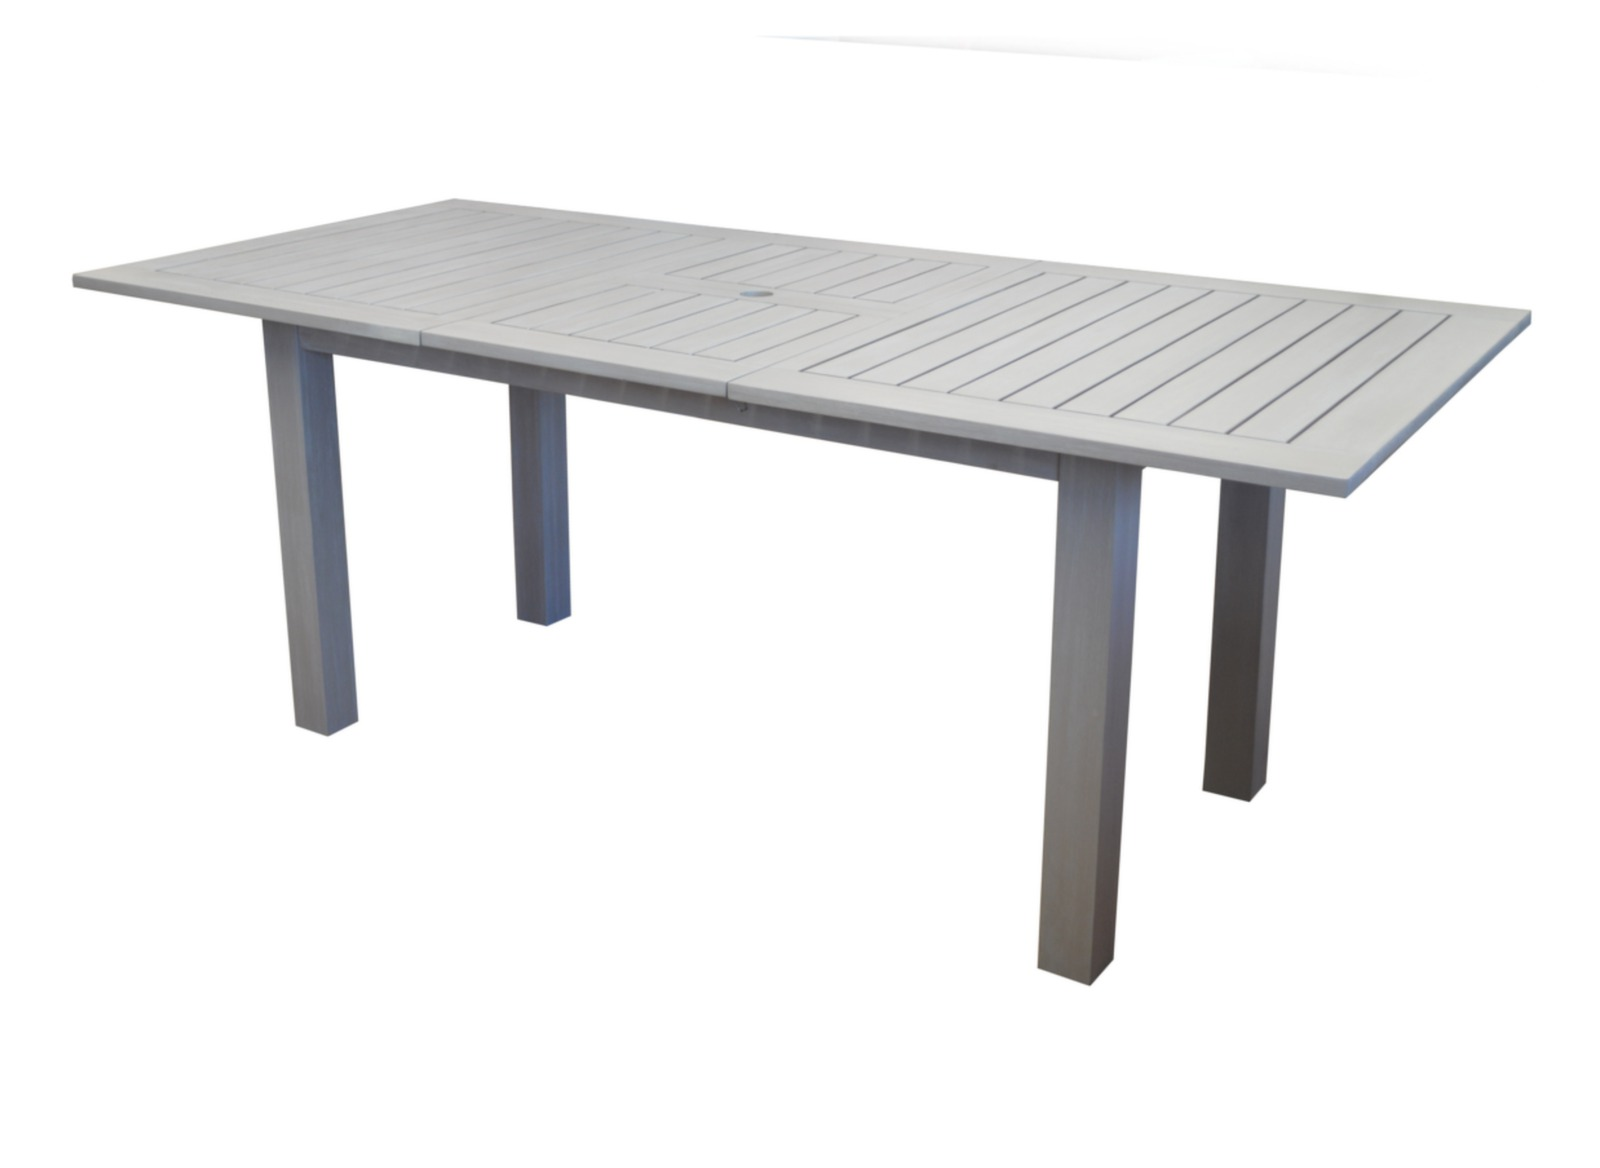 ensemble table niagara  cm chaises pliantes